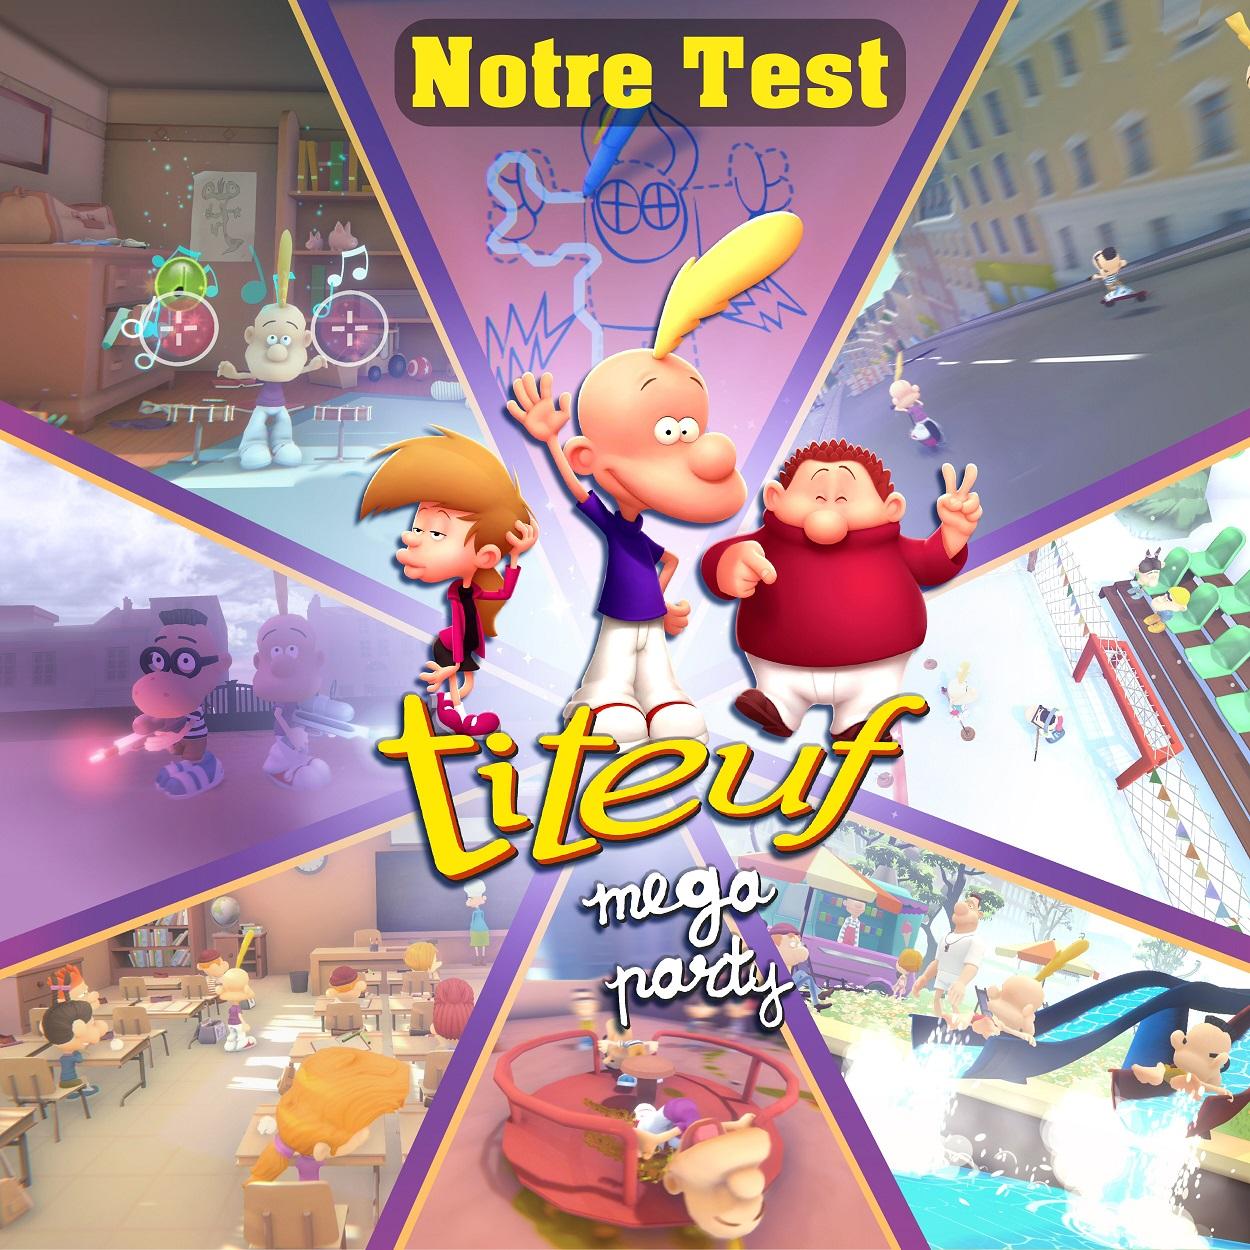 titeuf-test-1.jpeg